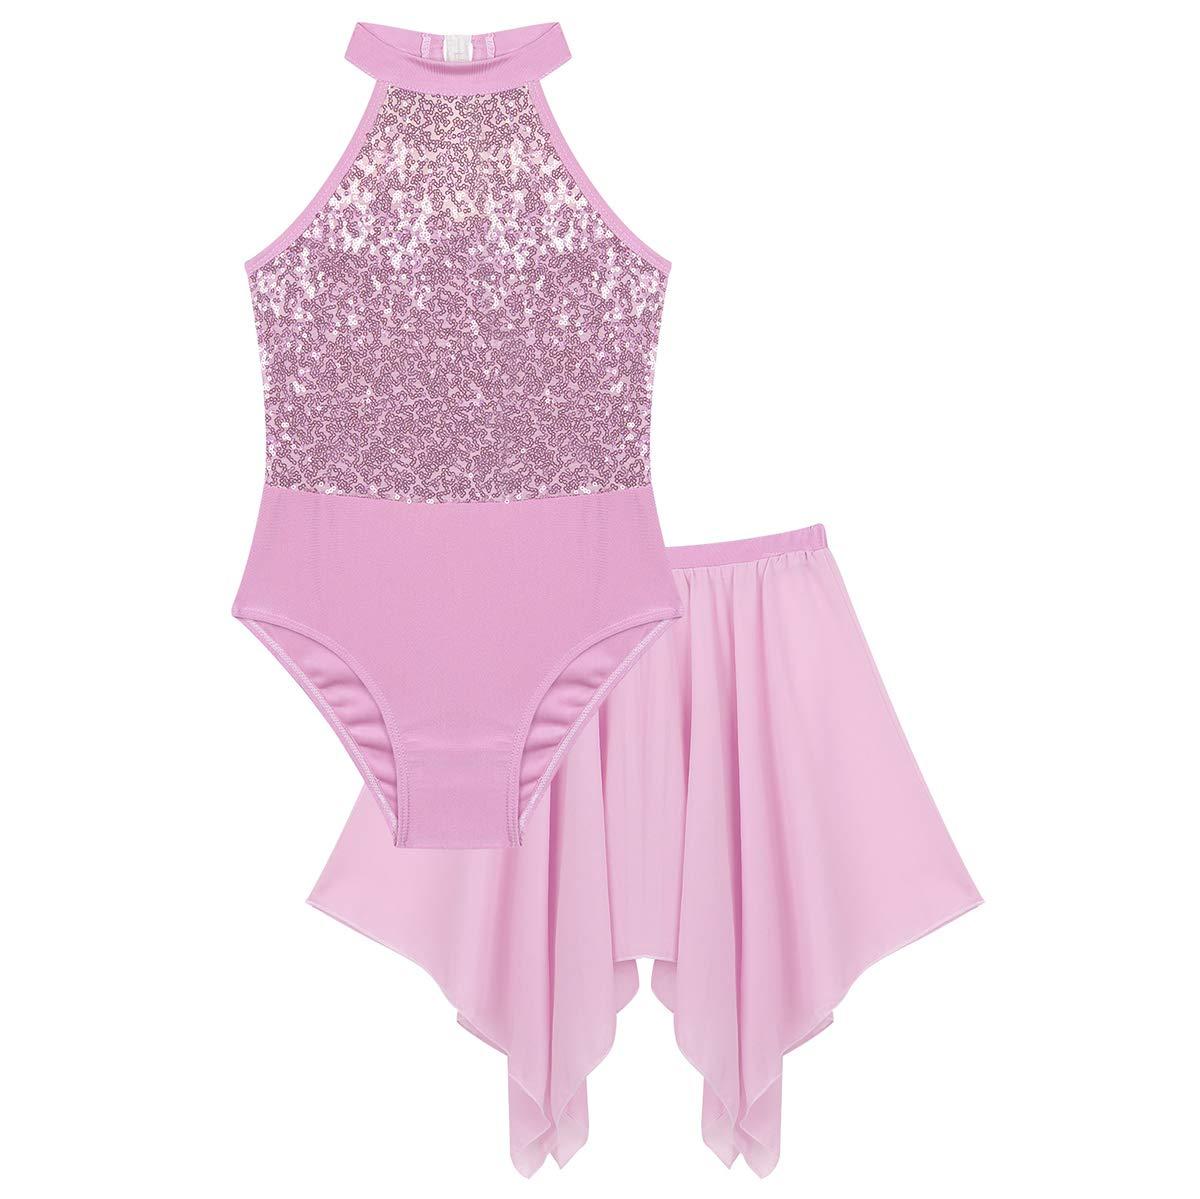 Alvivi Kids Girls 2PCS Shiny Sequin Halter Ballet Dance Outfit Halter Sleeveless Leotard with Chiffon Irregular Skirt Set